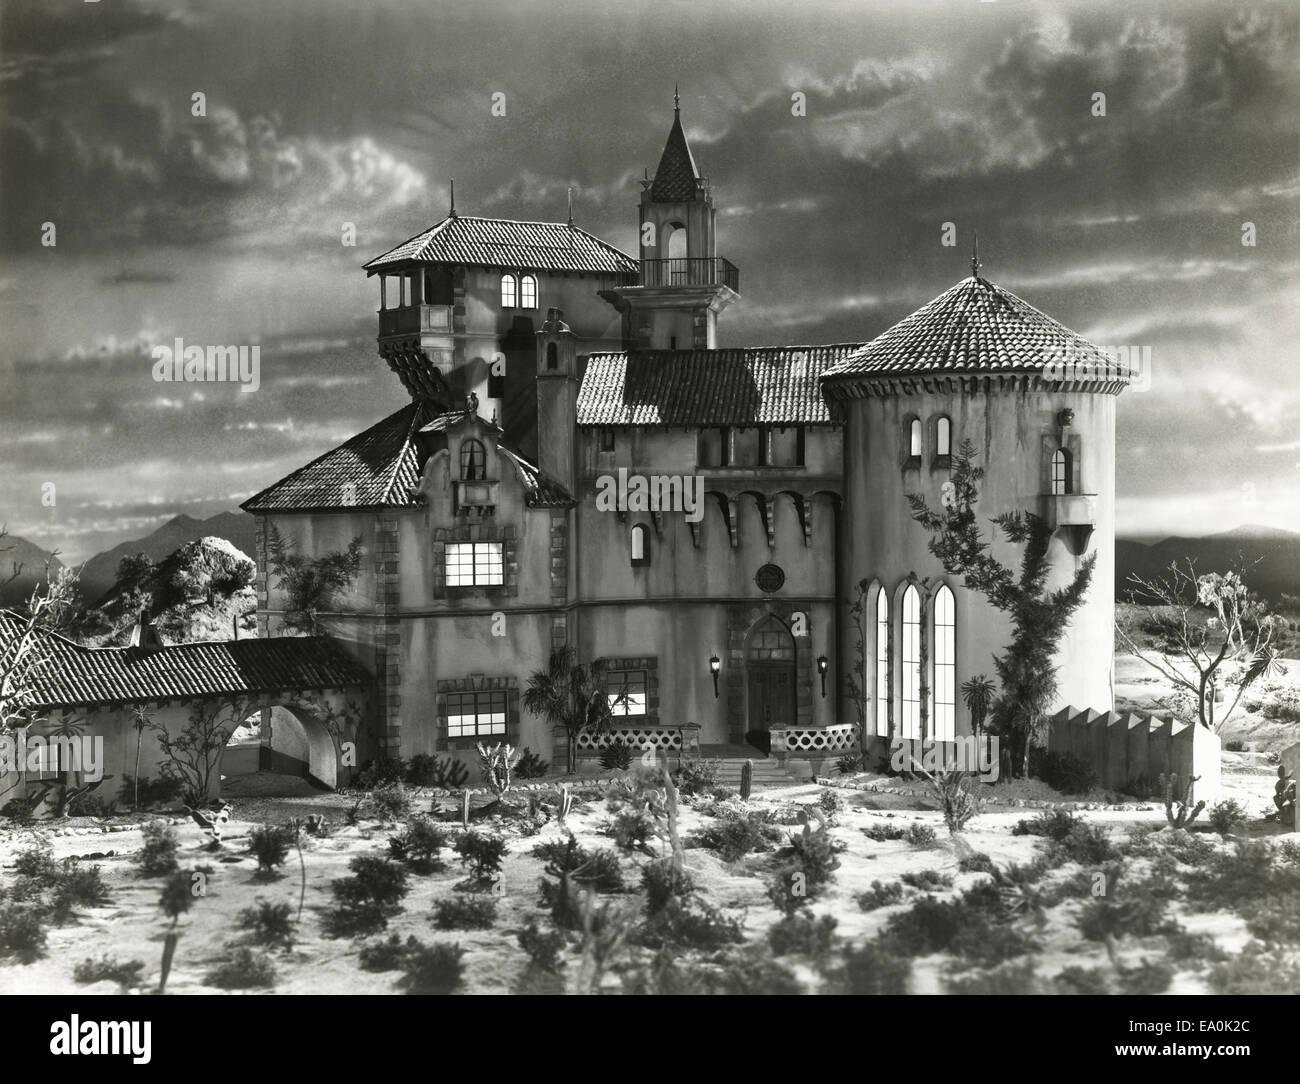 Haunted house - Stock Image